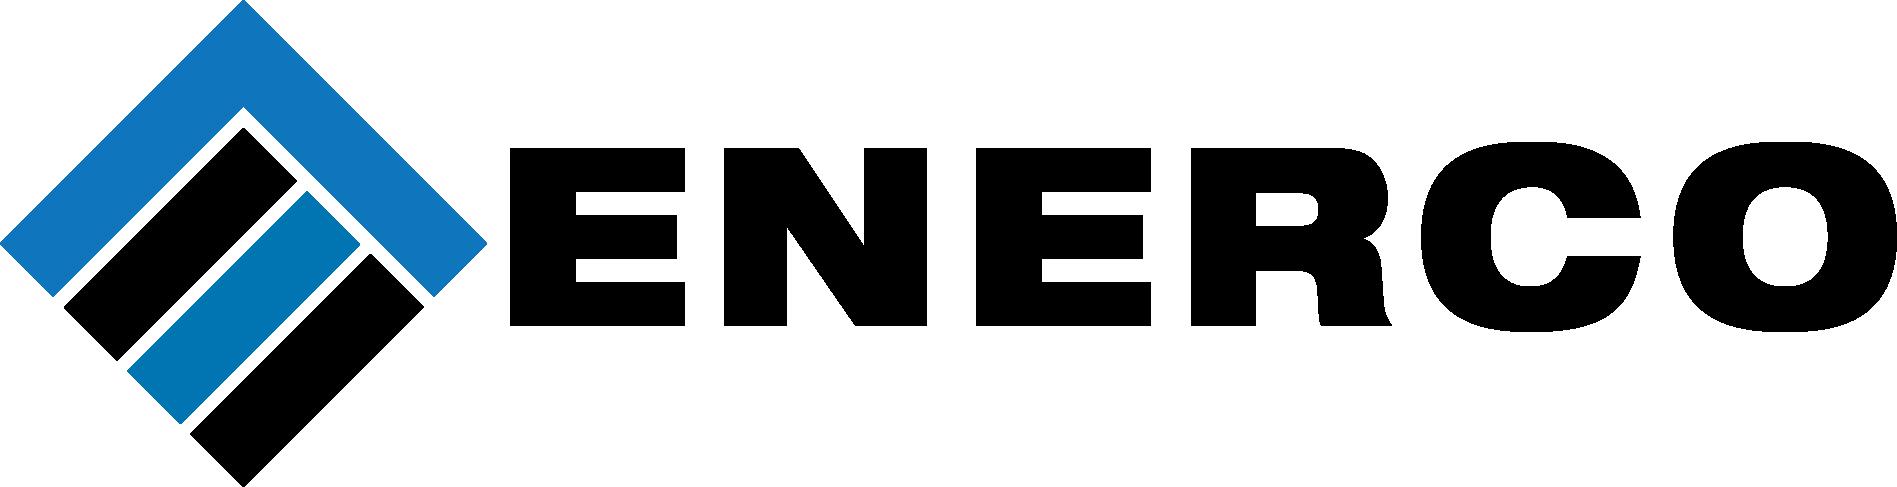 Horizontal Propane Two Stage Regulator w/ POL Clamshell